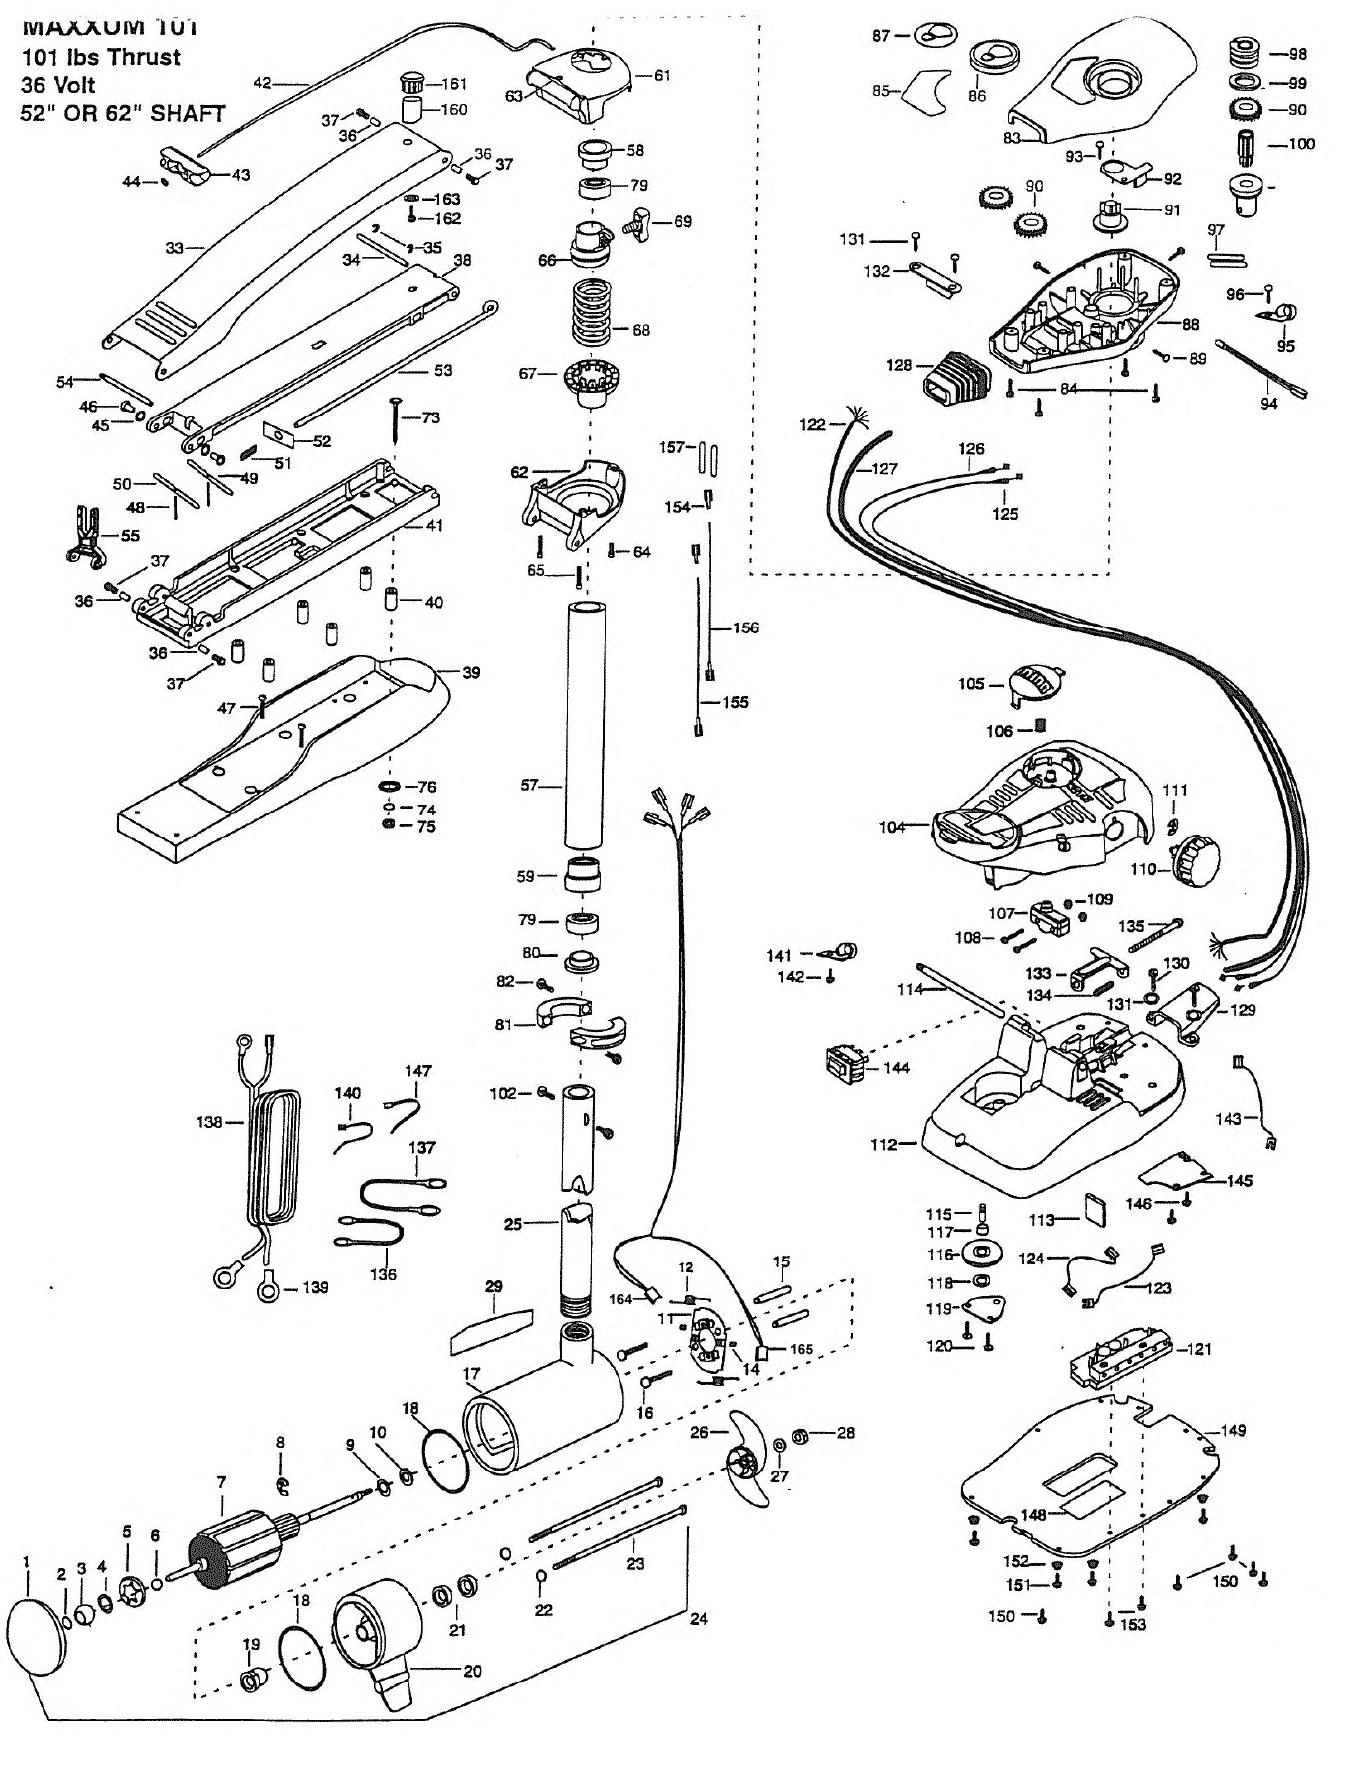 minn kota riptide wiring diagram Download-36 Volt Trolling Motor Wiring Diagram Minn Kota Riptide Wiring Diagram Sample 17-d